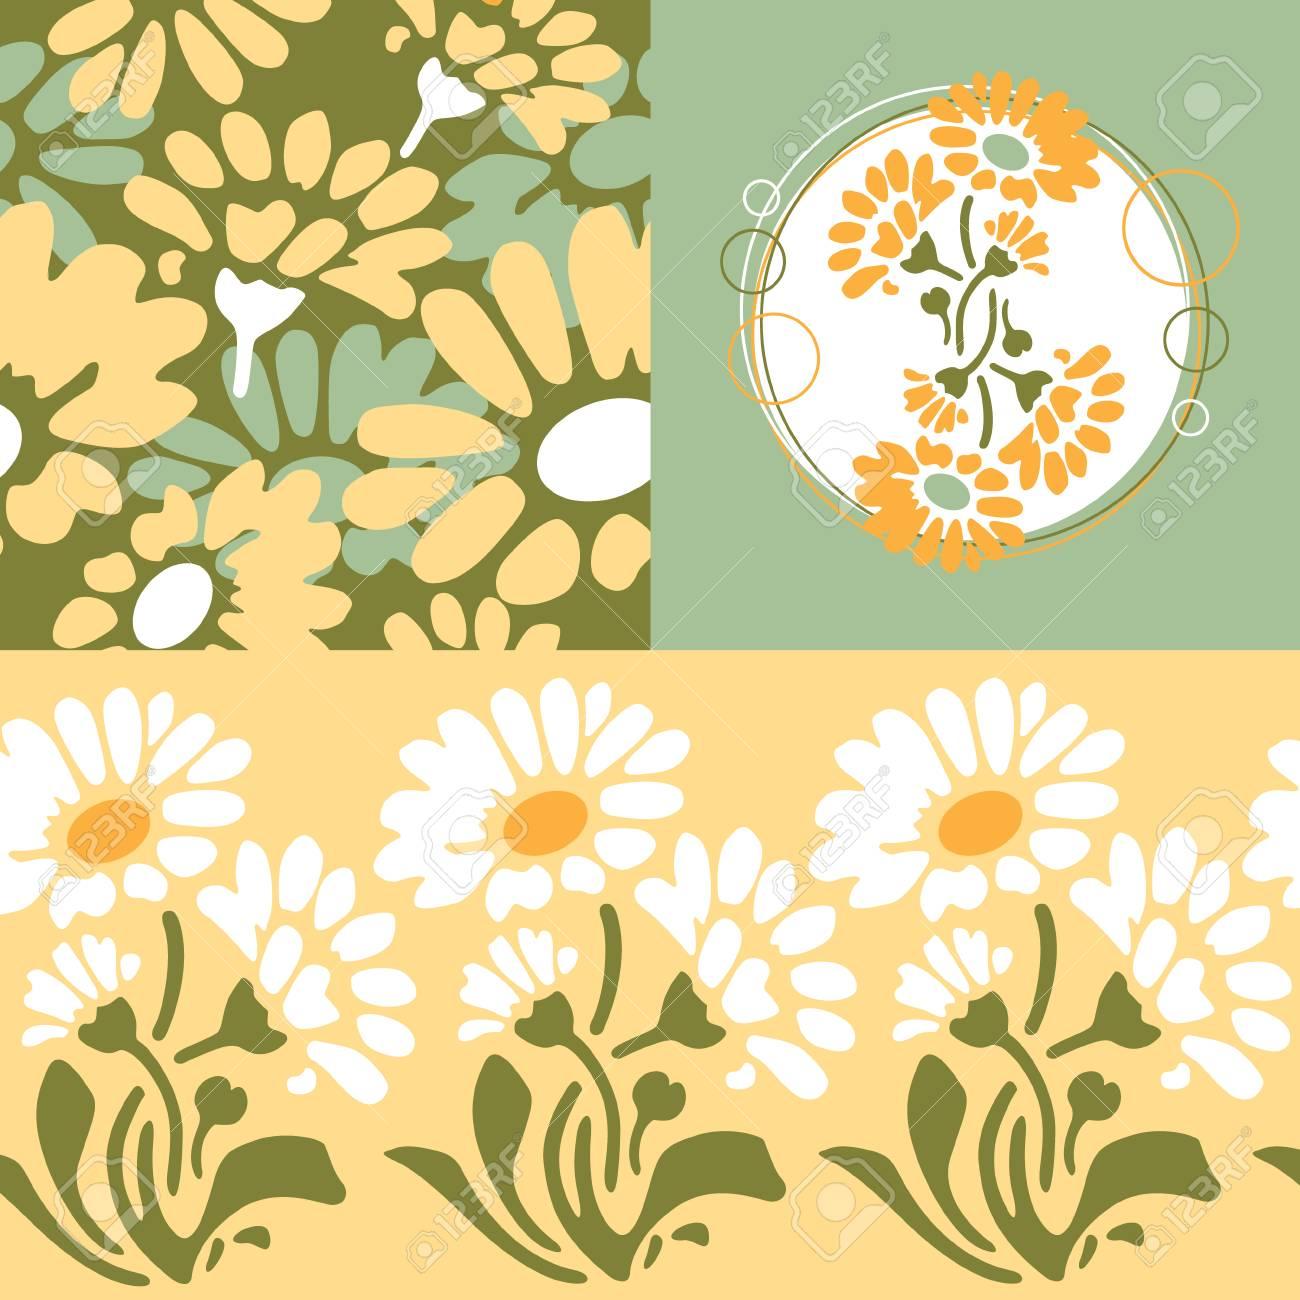 Retro Floral Wallpaper Design Royalty Free Cliparts Vectors And